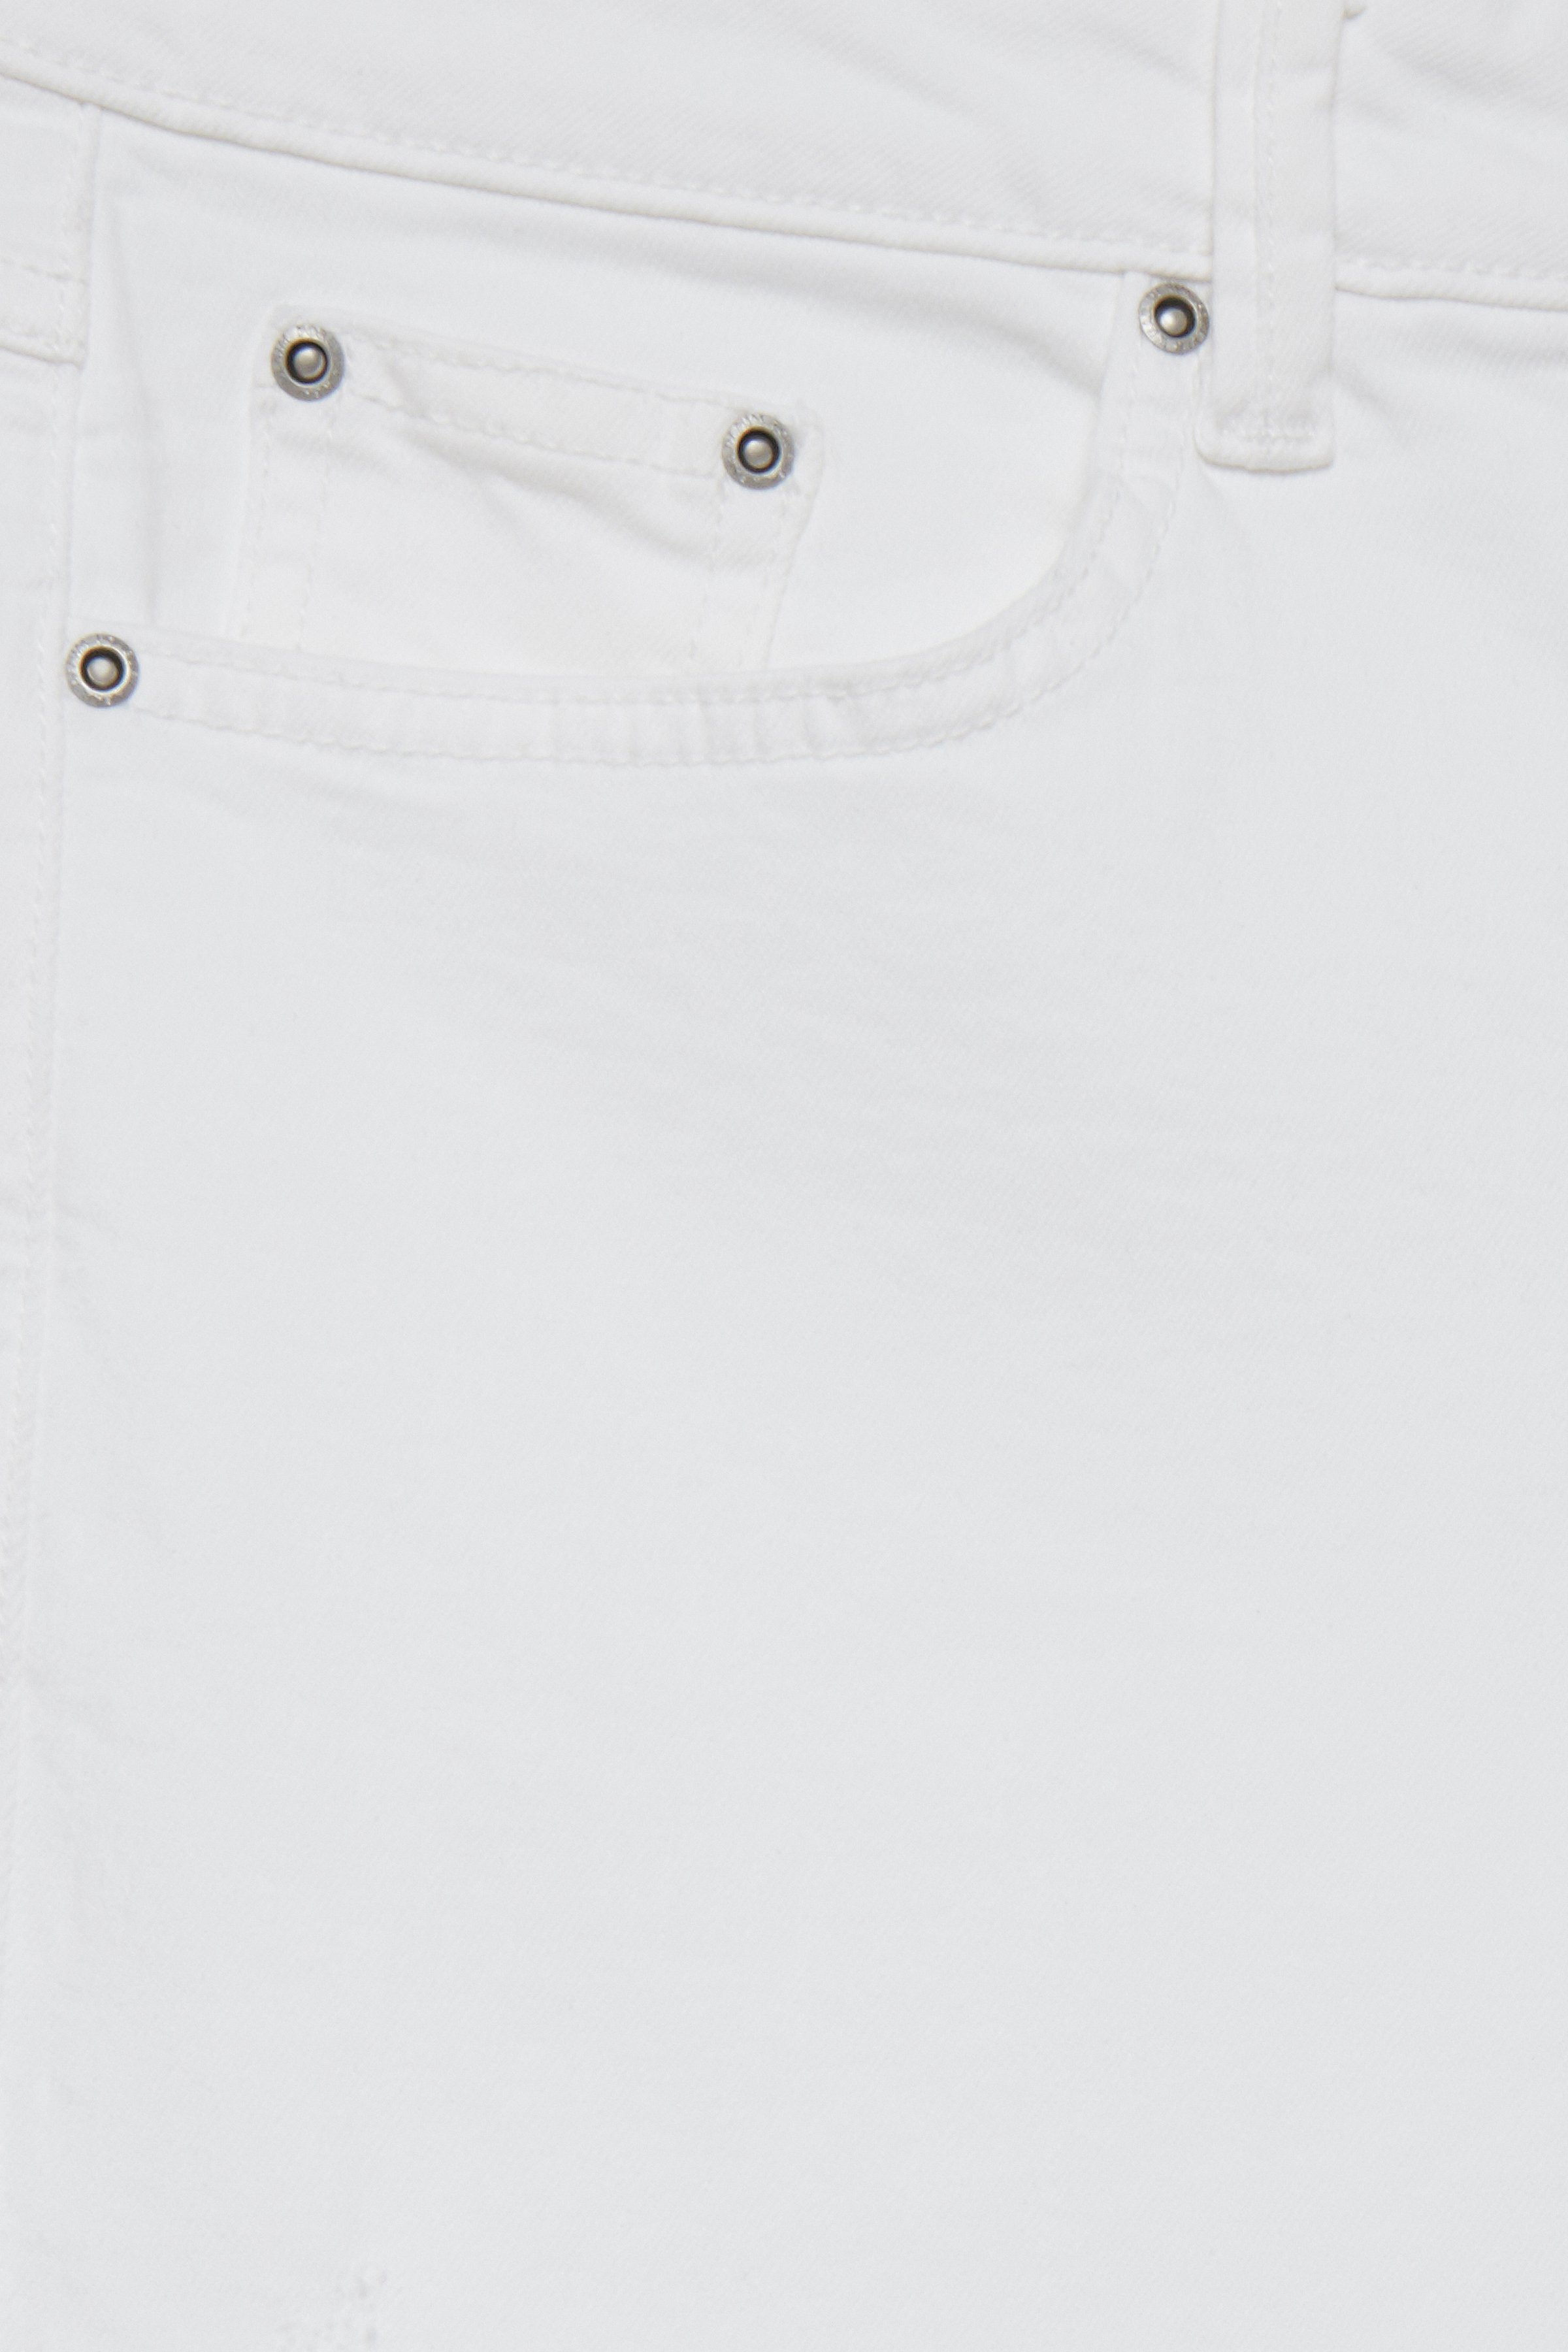 Optical White Lola luni Jeans von b.young – Kaufen Sie Optical White Lola luni Jeans aus Größe 25-36 hier